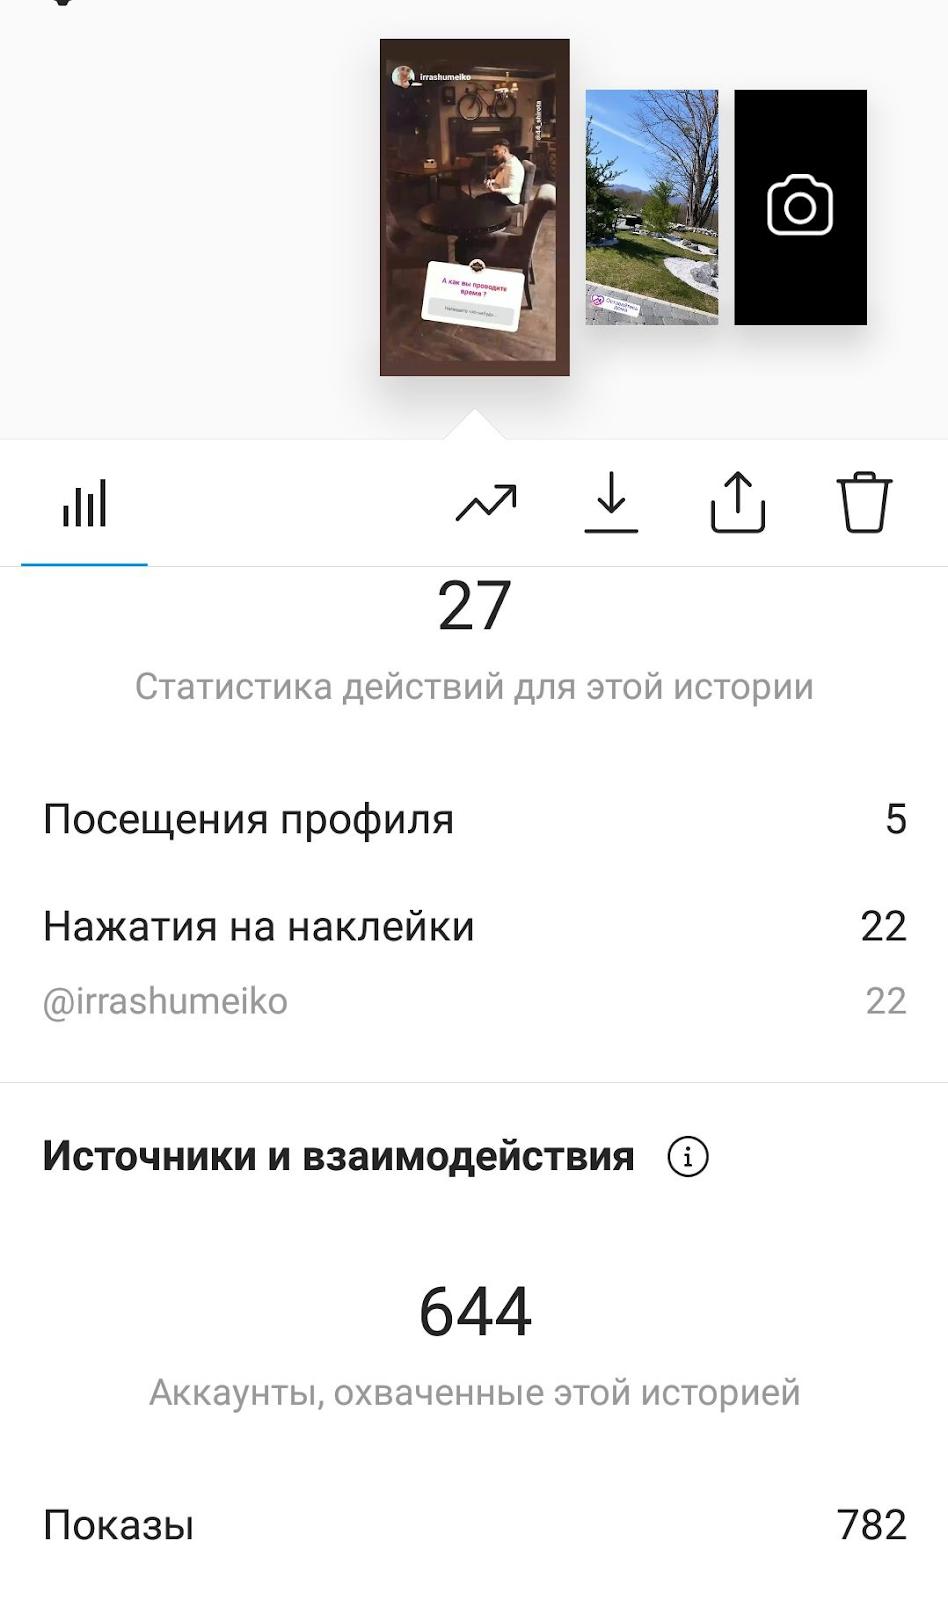 duy-MCLmGUE171_BogXCuhruspr_kEjIyfK_wqRd